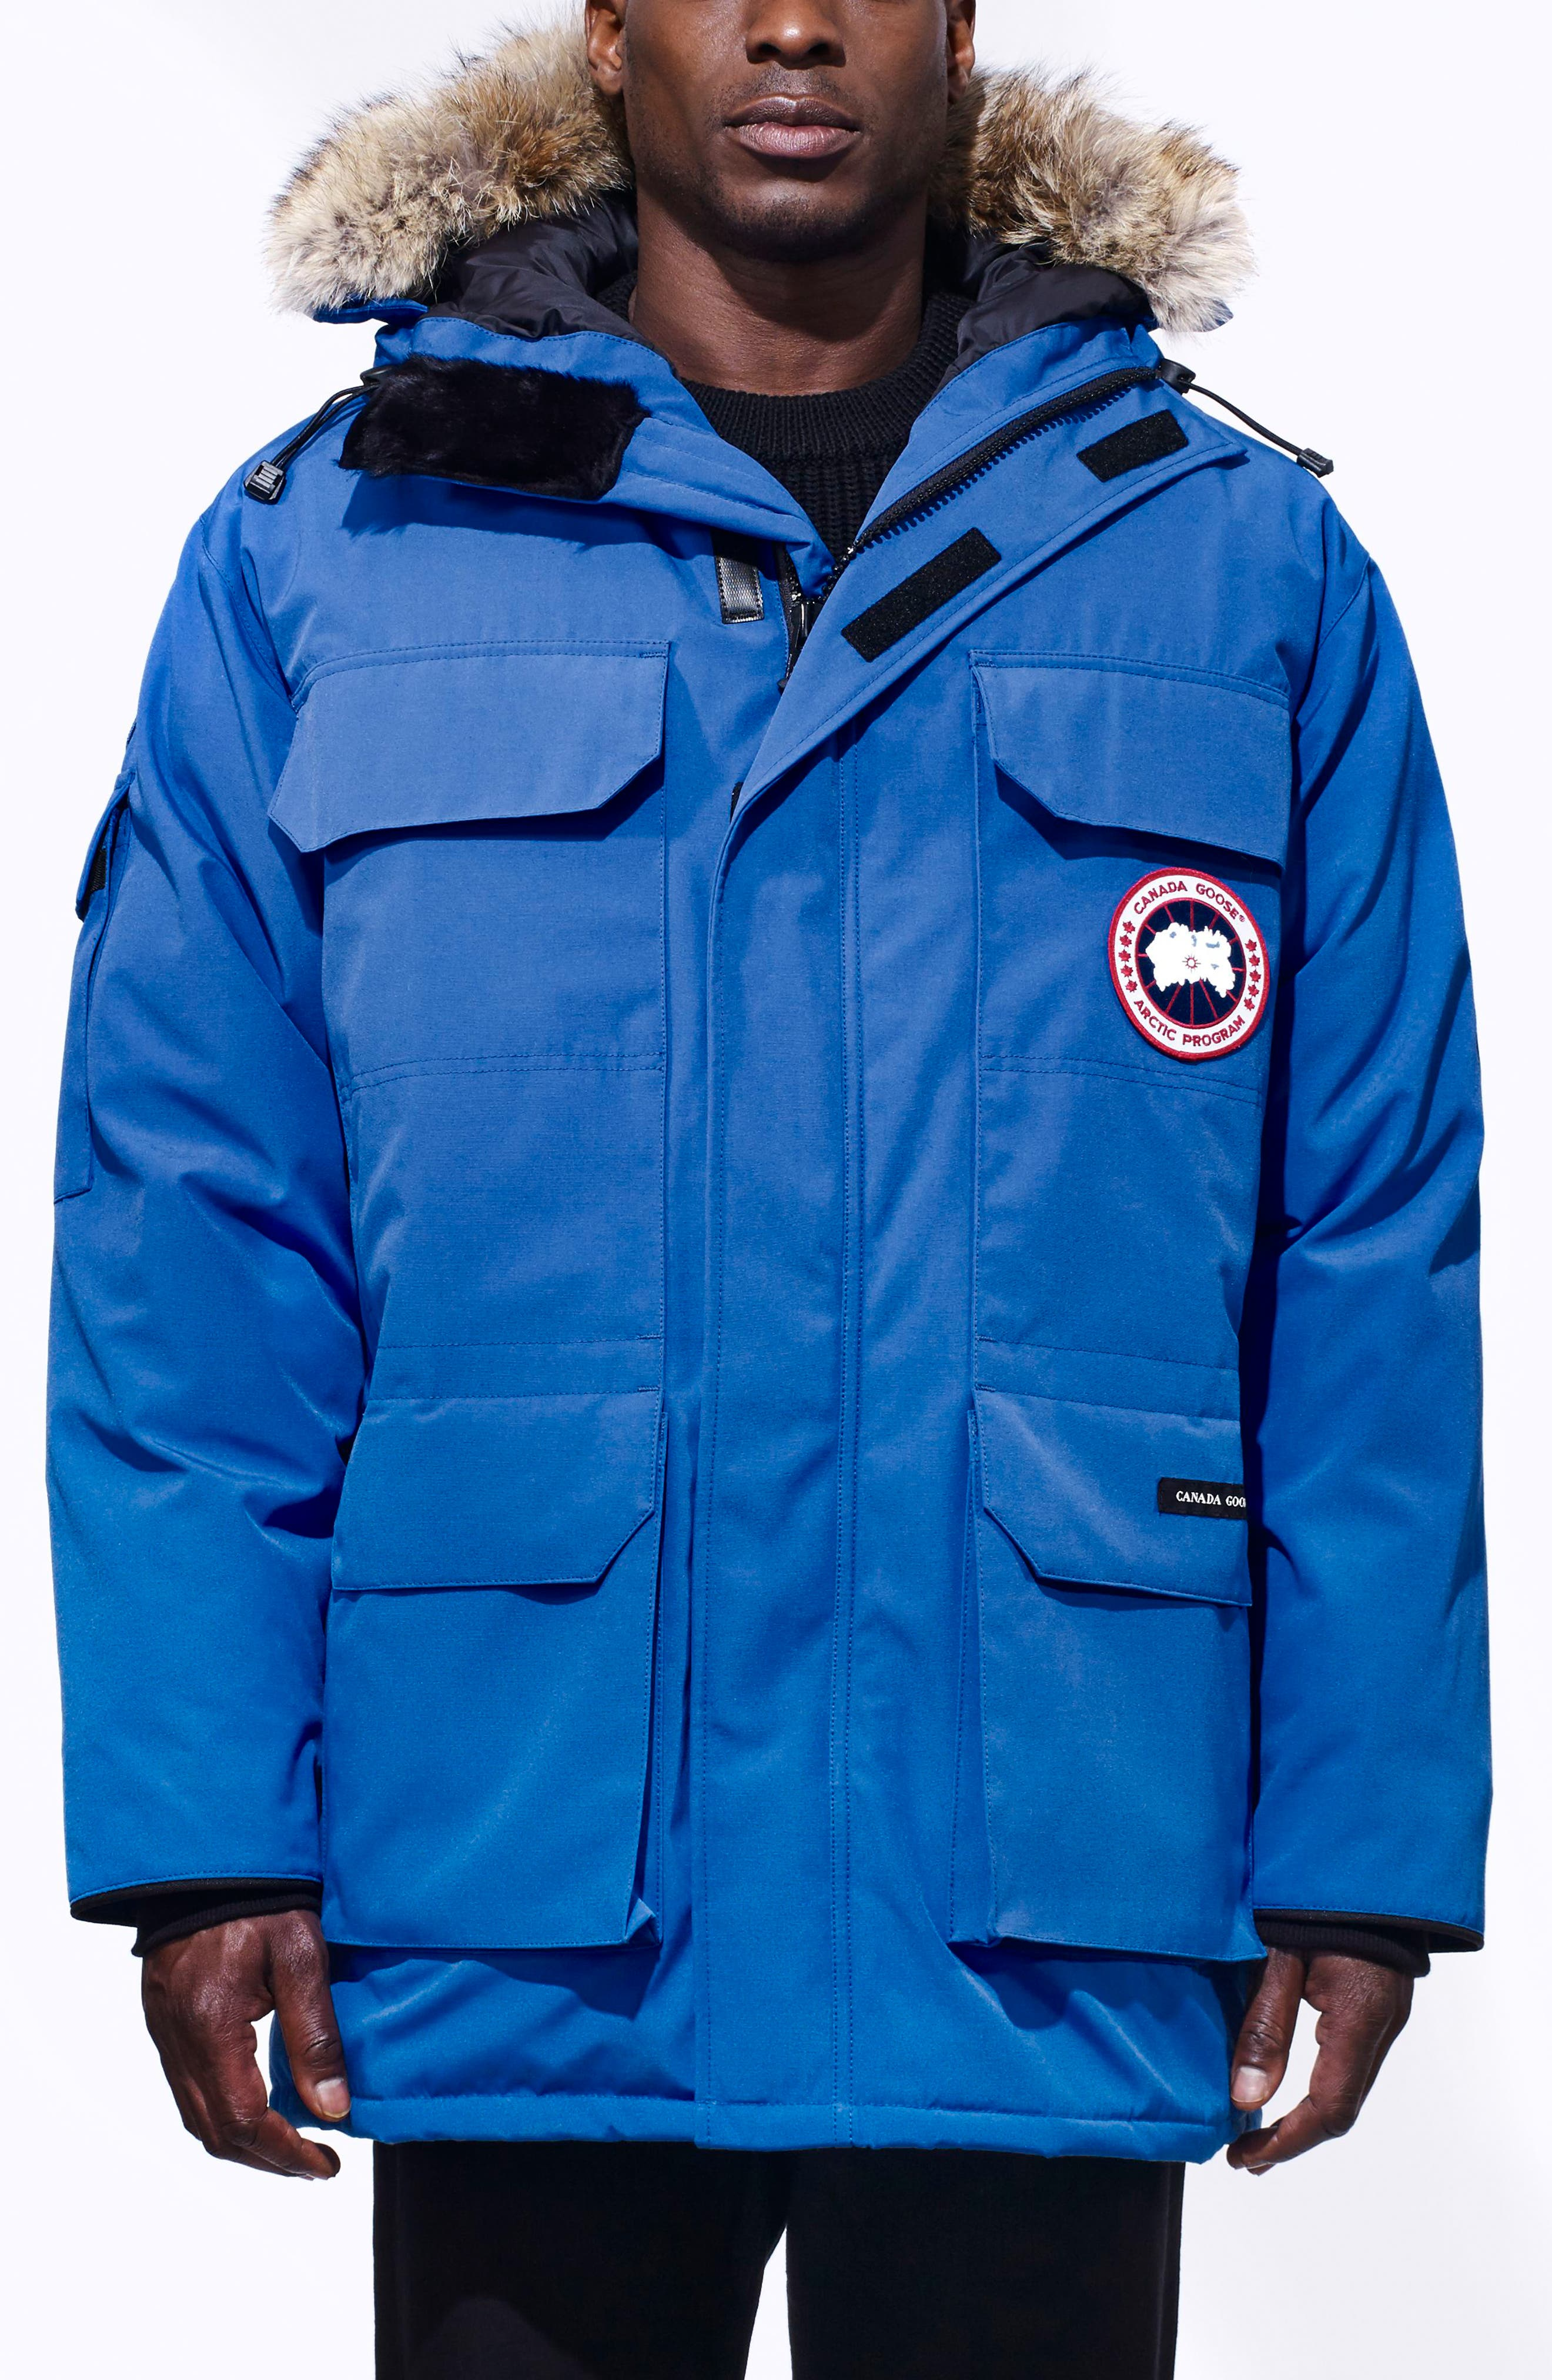 PBI Expedition Down Parka with Genuine Coyote Fur Trim,                         Main,                         color, Royal Pbi Blue